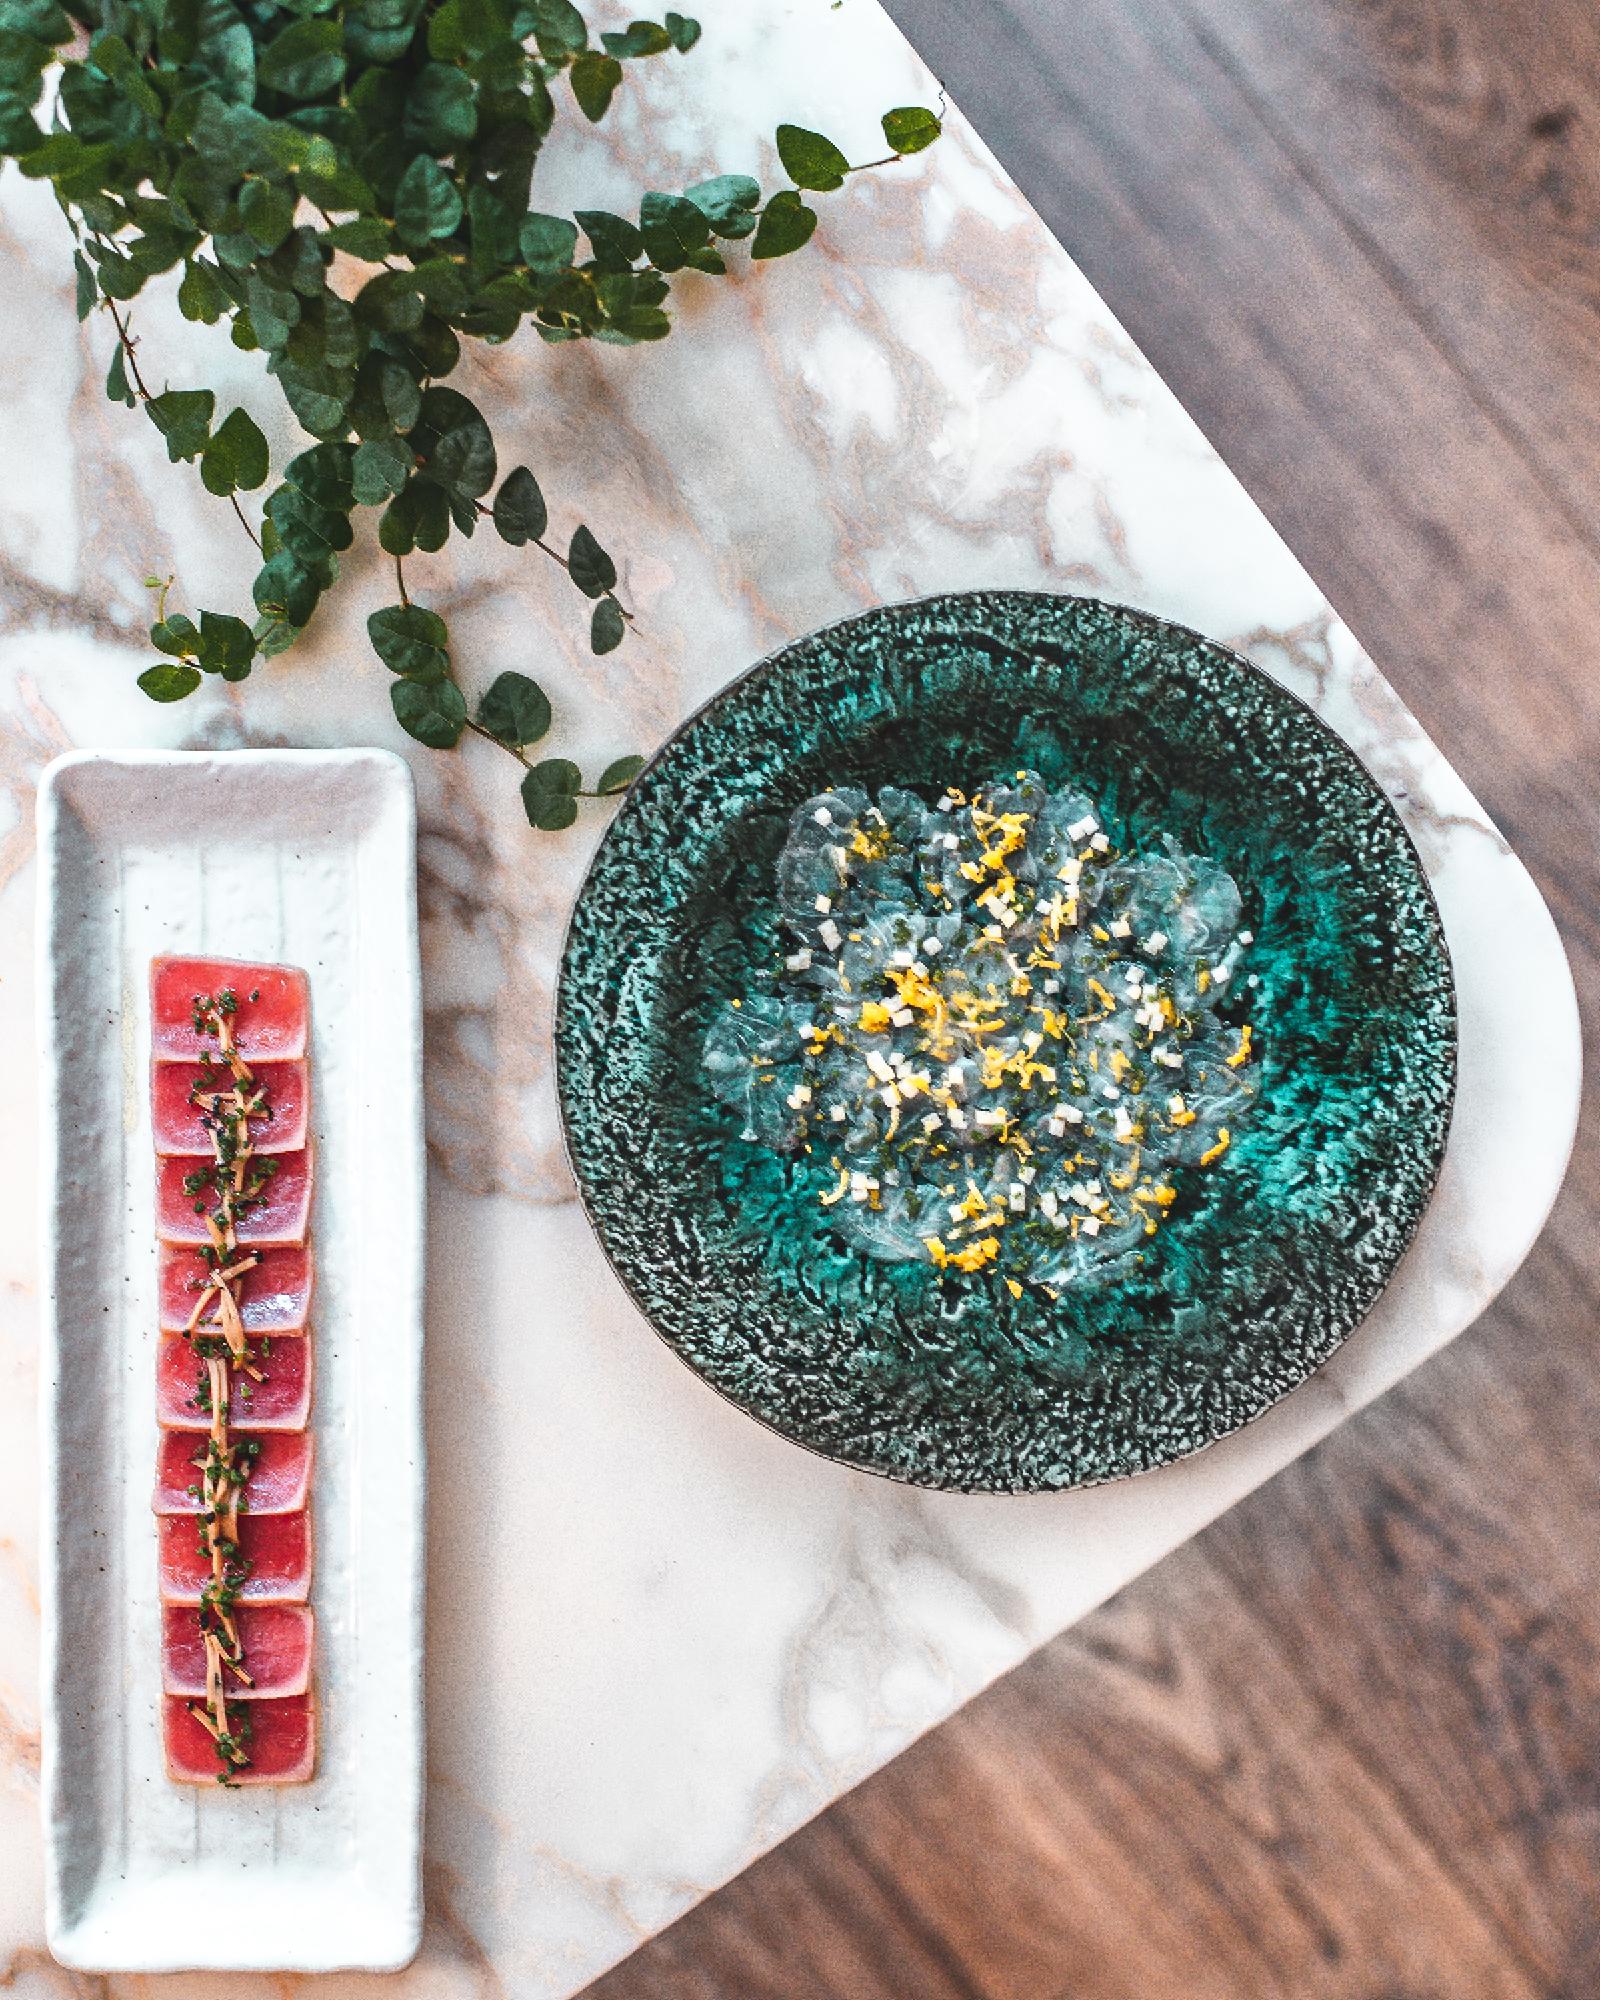 Yellowfin Tuna Carpaccio at Bloomsbury Street Kitchen